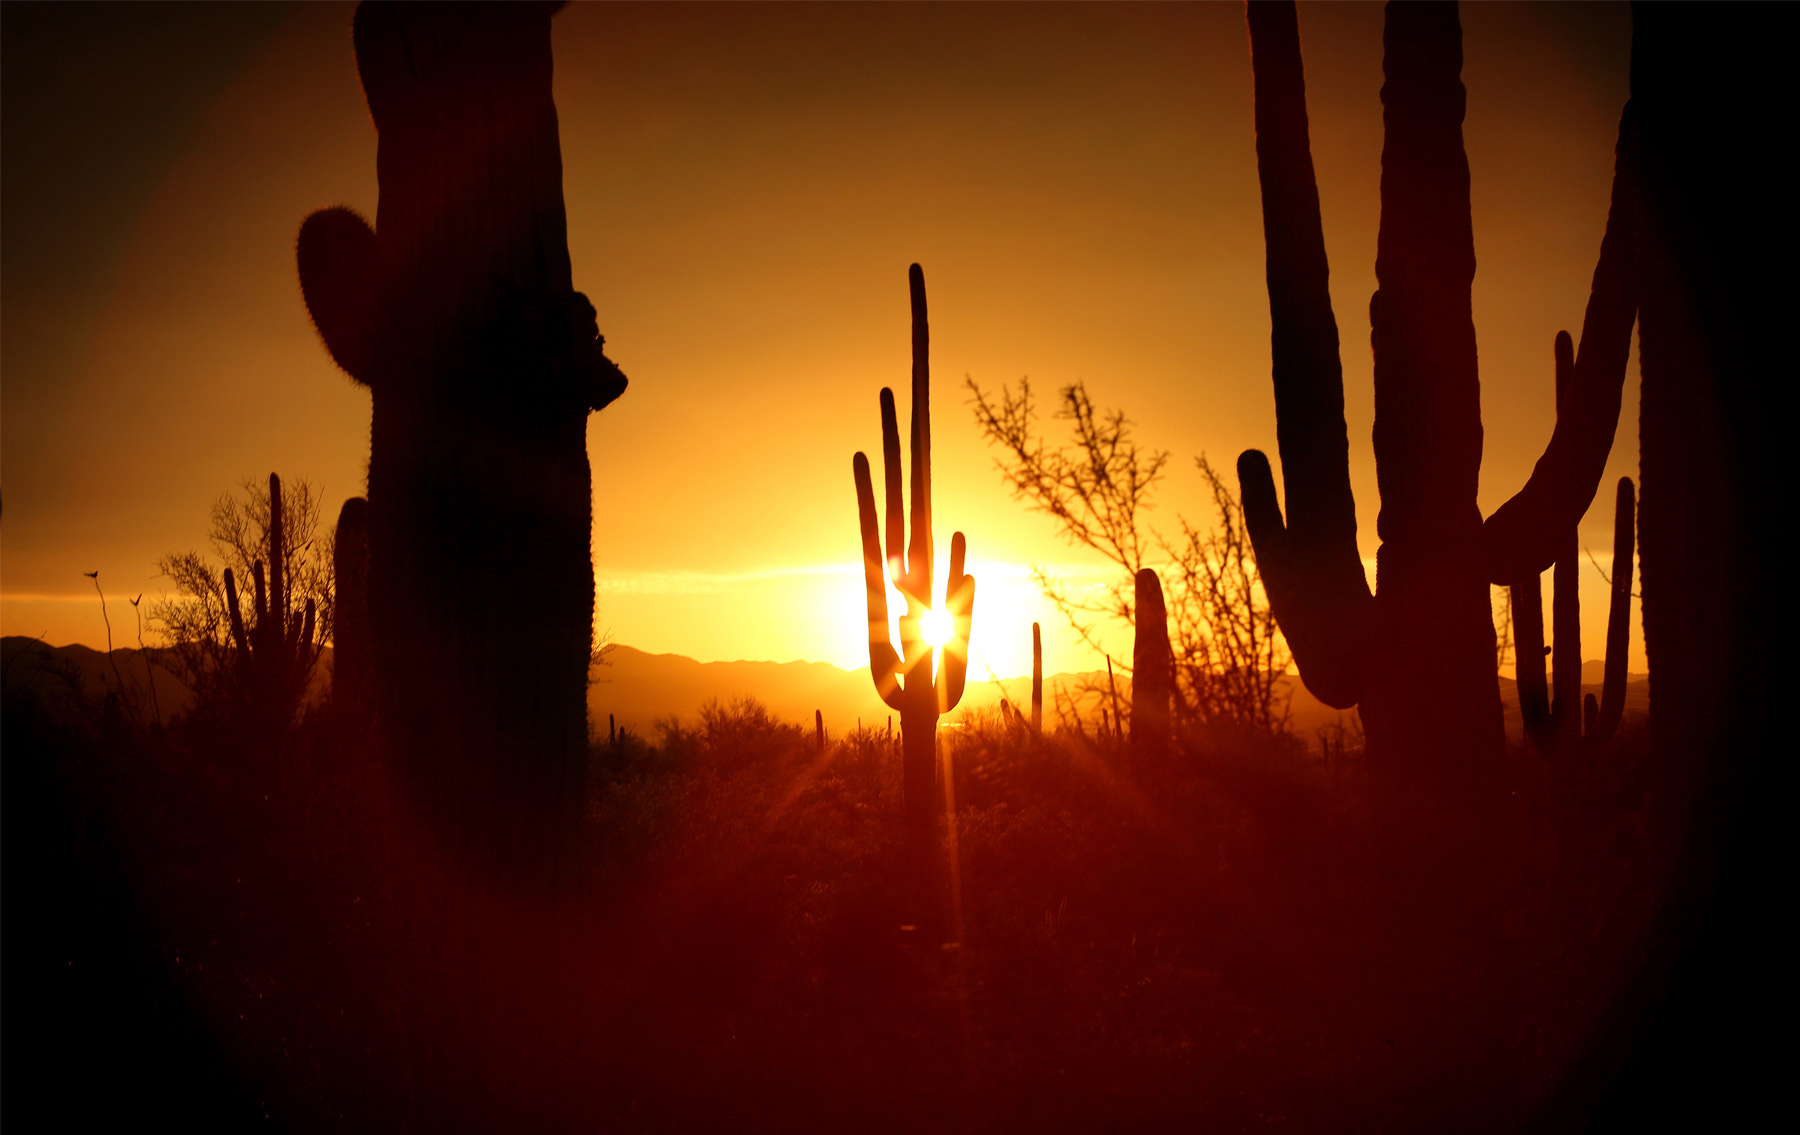 14-Tuscan-Arizona-Wedding-Photography-by-Vick-Photography-Destination-Wedding-Desert-Old-Tucson-Studios-Cactus-Sunset-Night-Photography-Elsa-and-Arthur.jpg